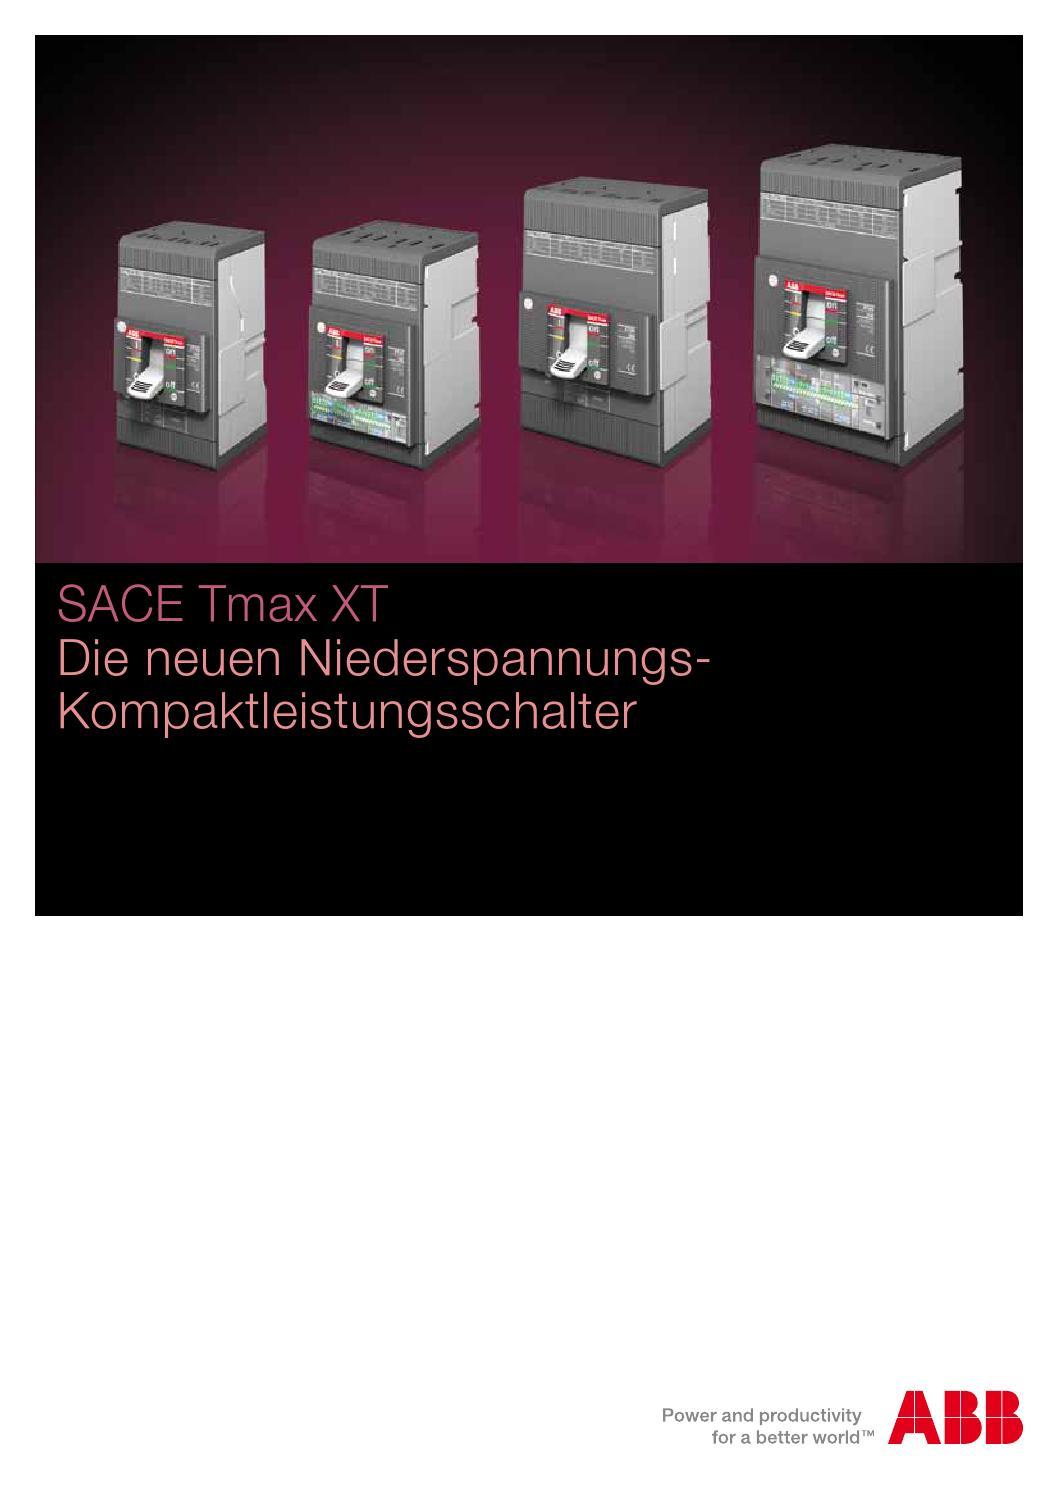 SACE Tmax XT Niederspannungs Kompaktleistungsschalter by ABB ASJ - issuu